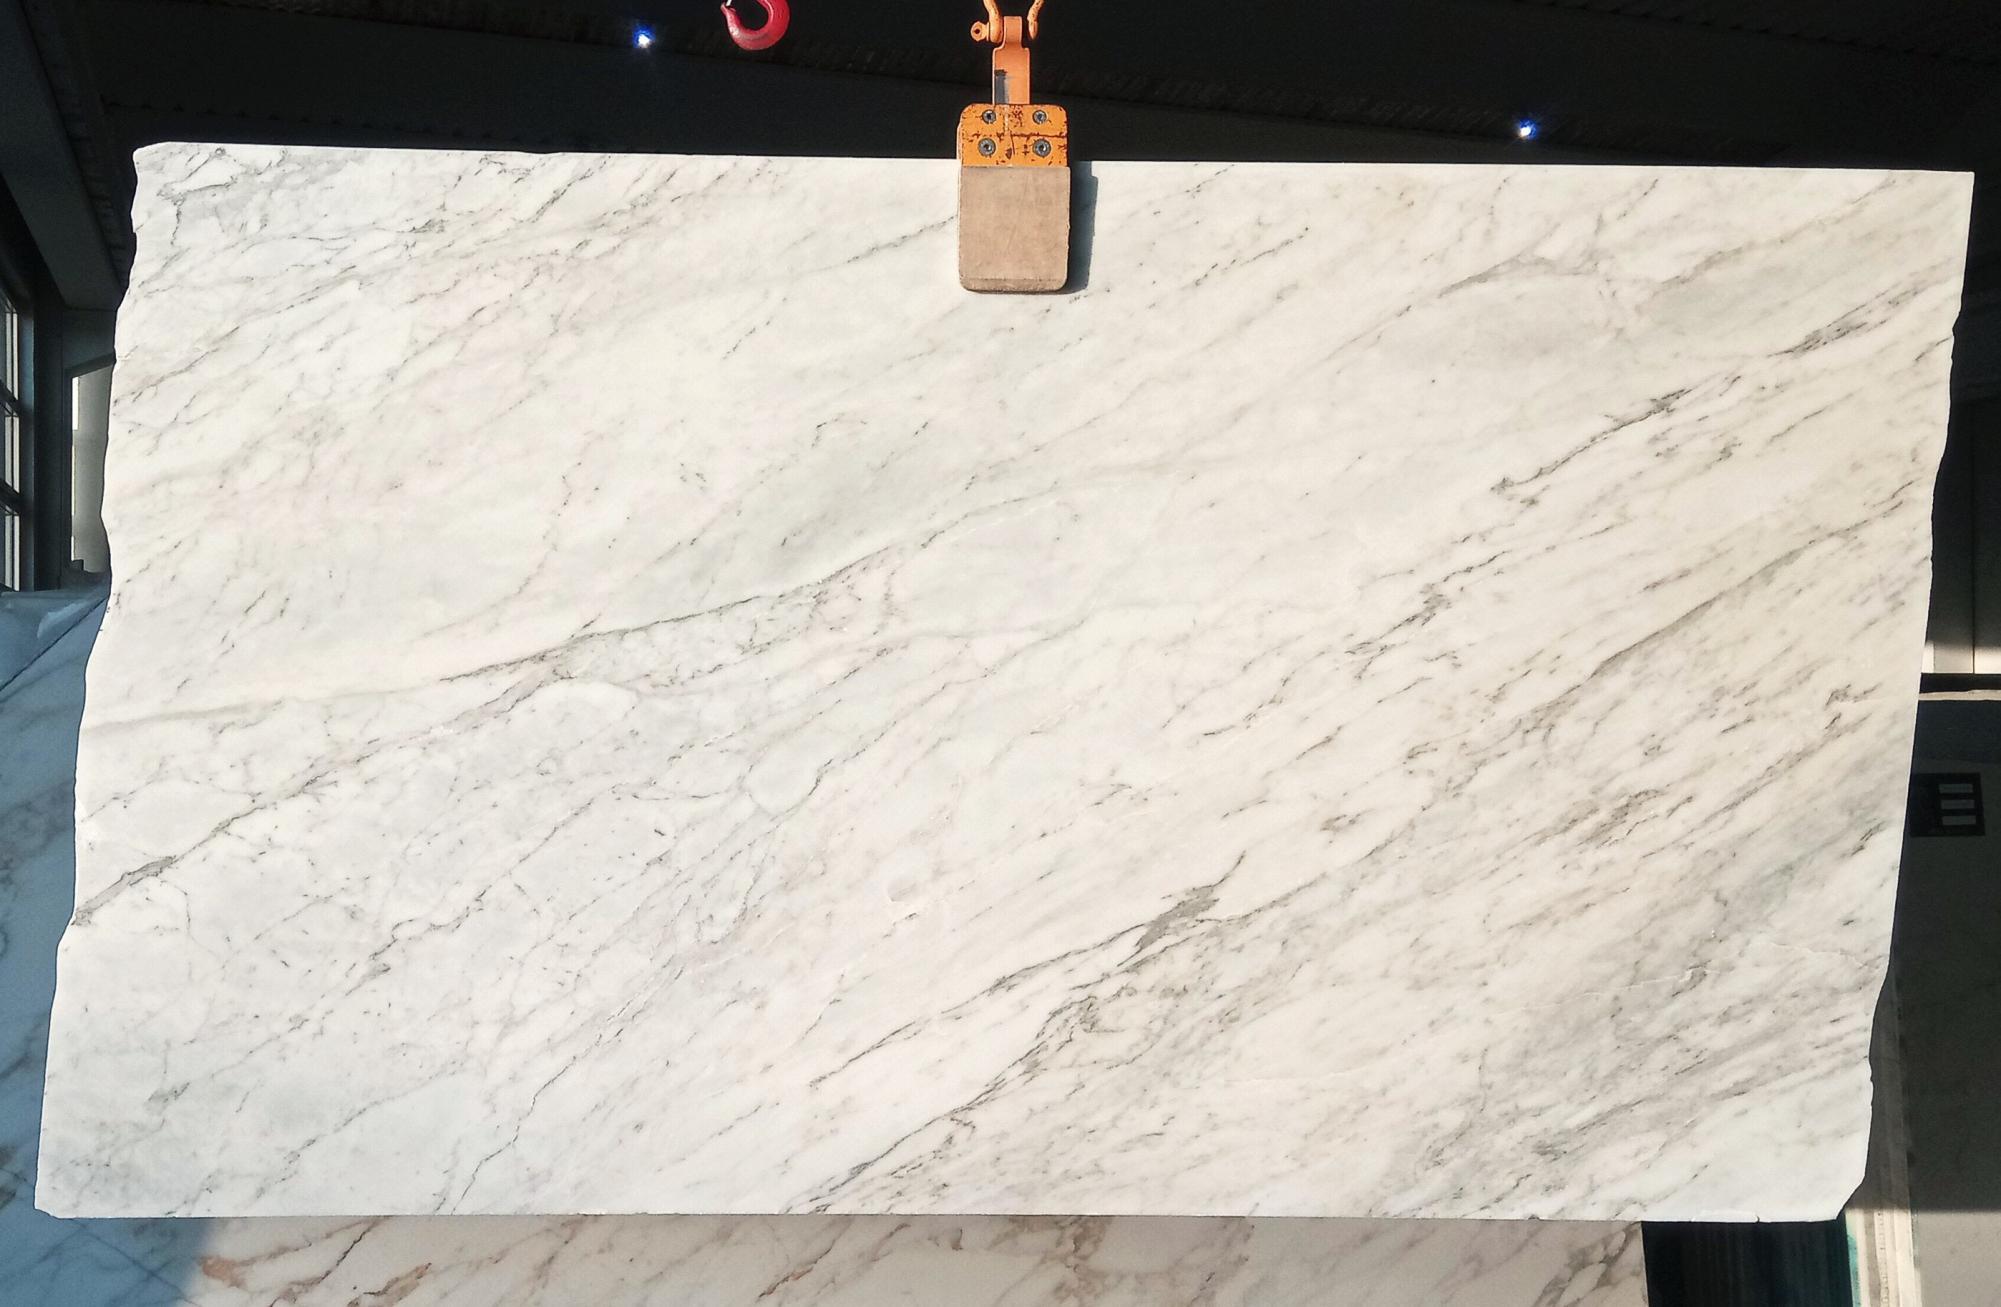 CALACATTA ARNI Suministro Veneto (Italia) de planchas pulidas en mármol natural Z0175 , Slab #50